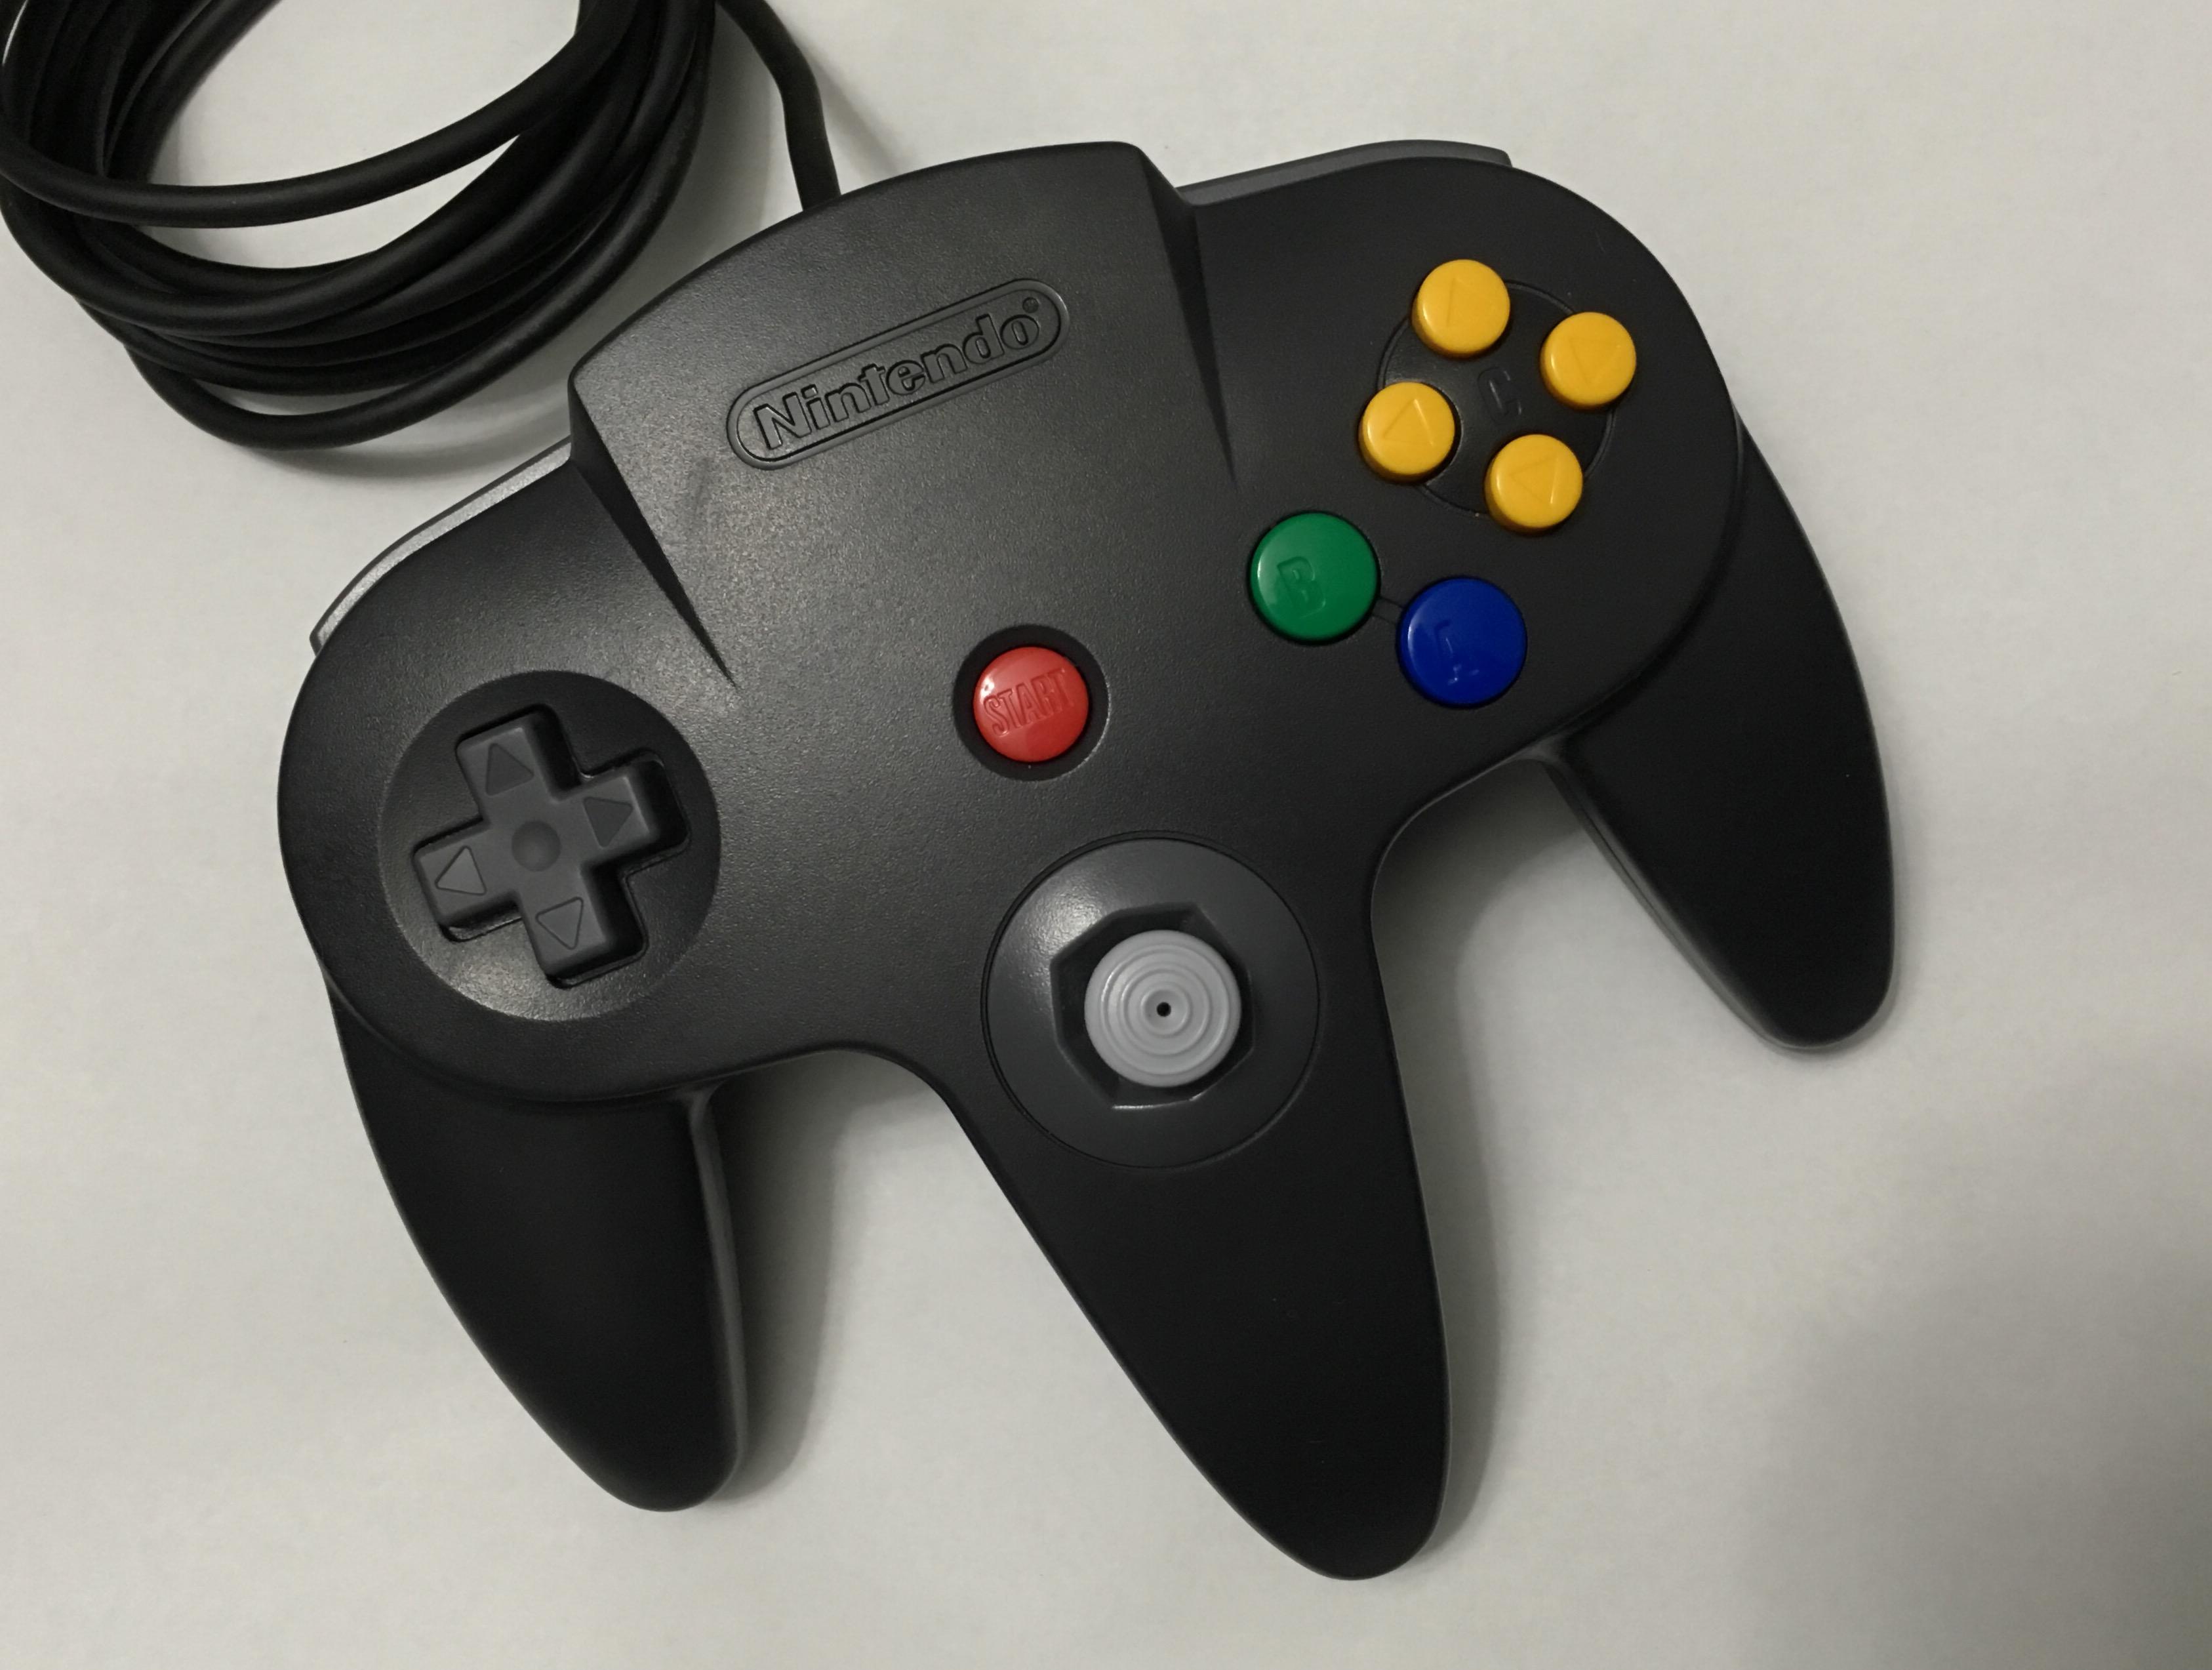 Nintendo 64 Console Diagram - Wiring Diagram Verified on